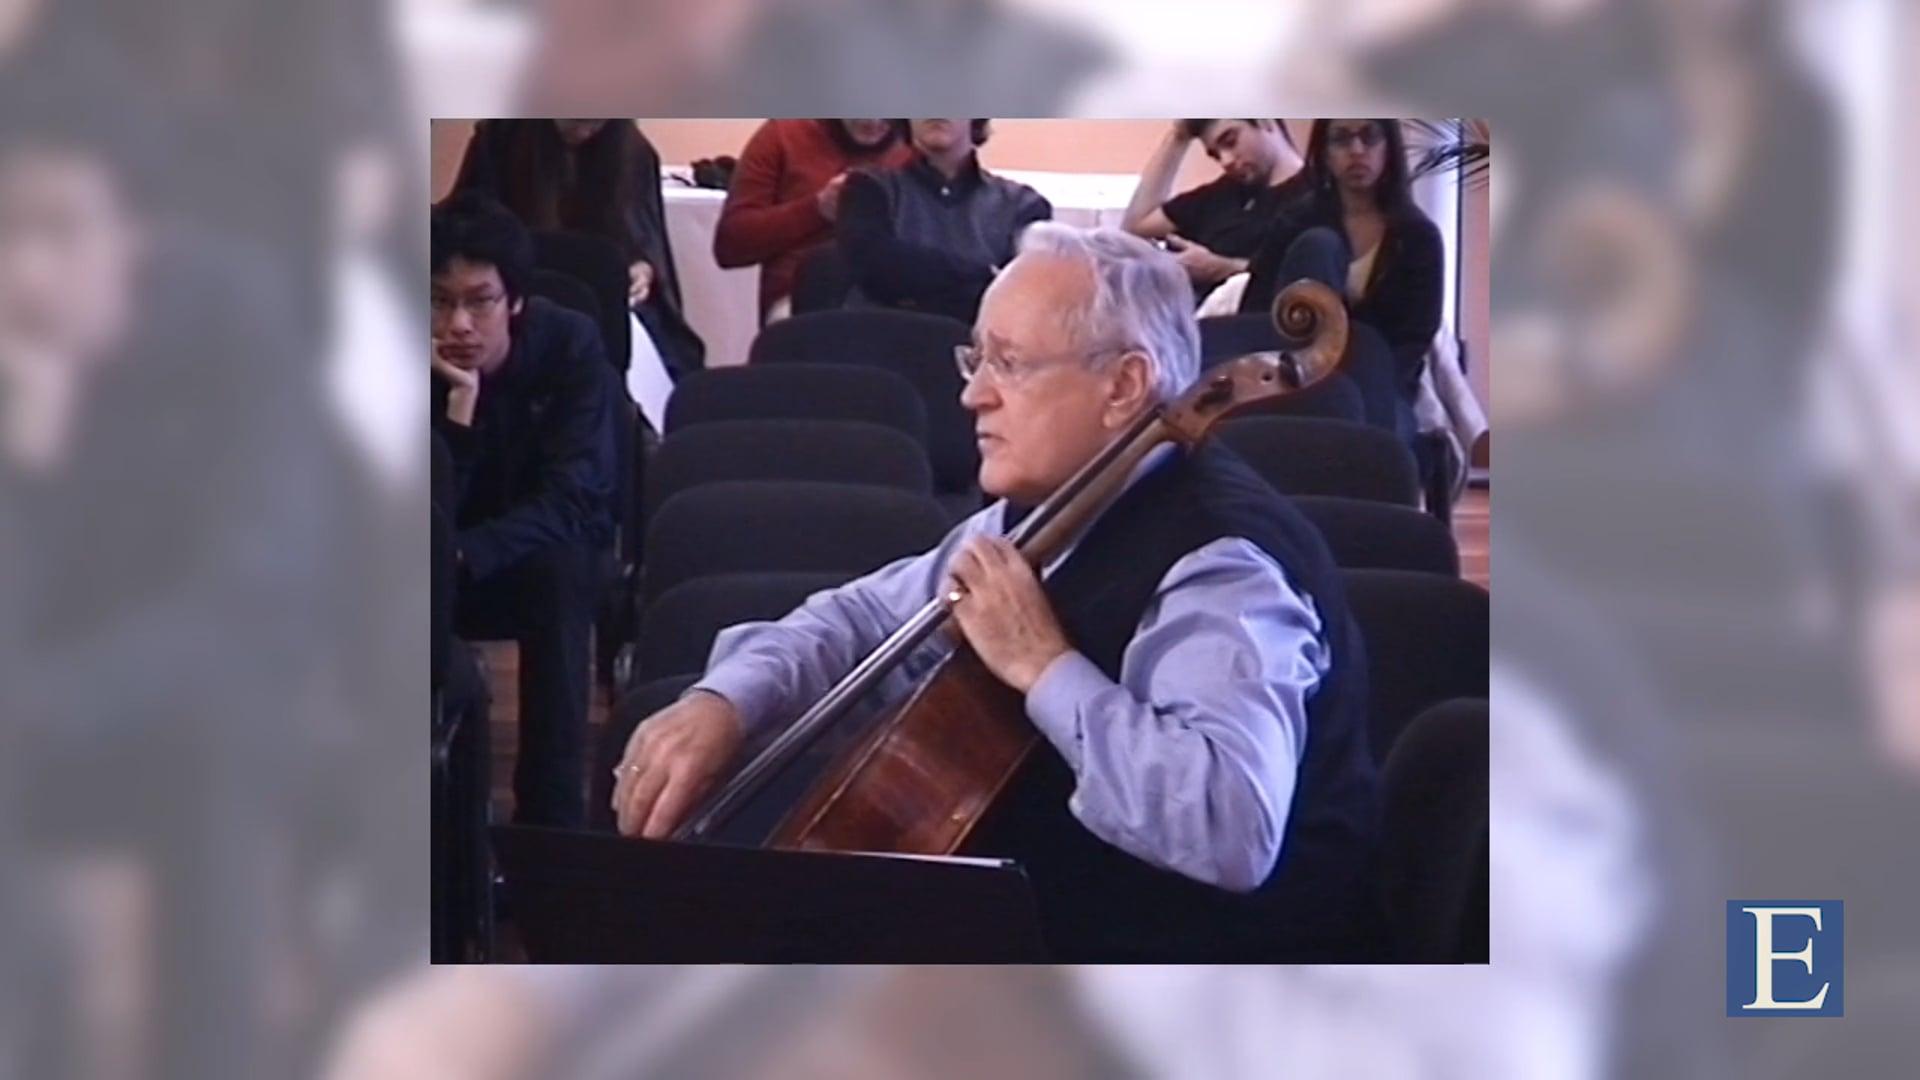 Canal Escuela  | David Geringas: Debussy – Cello sonata CD 144 – I. Prologue